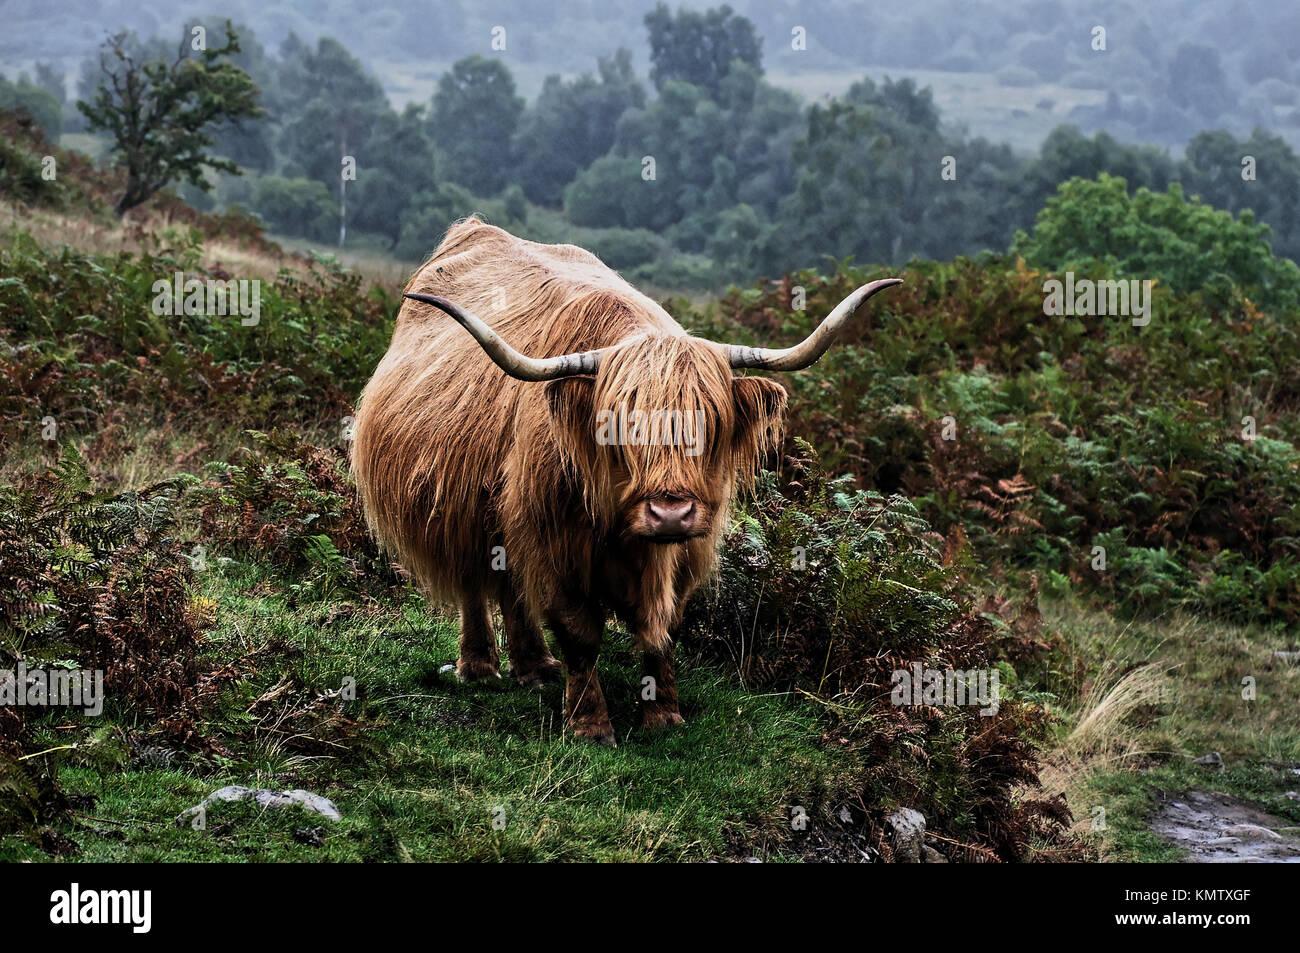 Highland cattle, Conic Hill, Scotland, United Kingdom - Stock Image